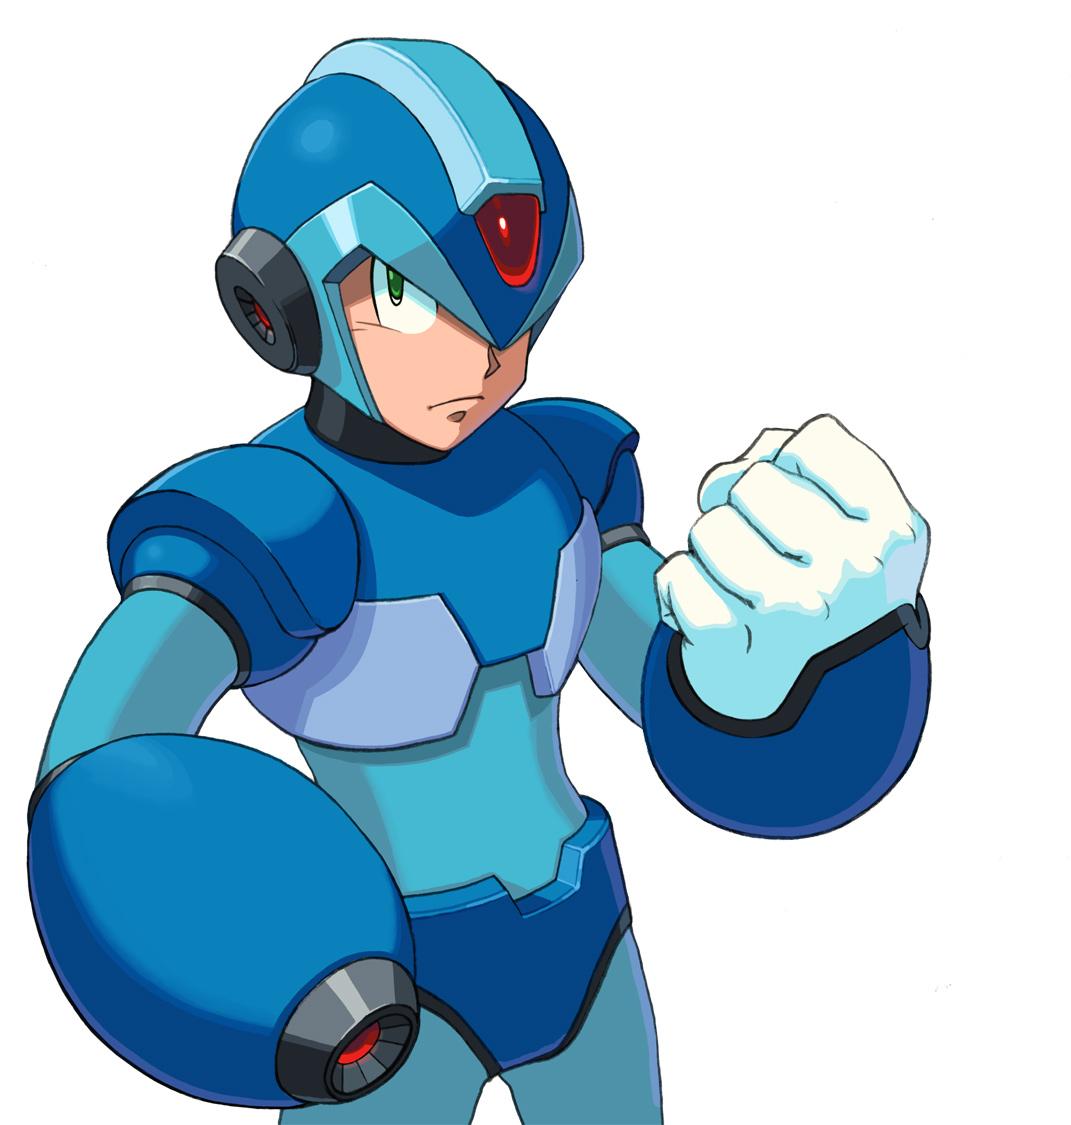 Mega man x7 gallery mmkb fandom powered by wikia - Megaman wikia ...